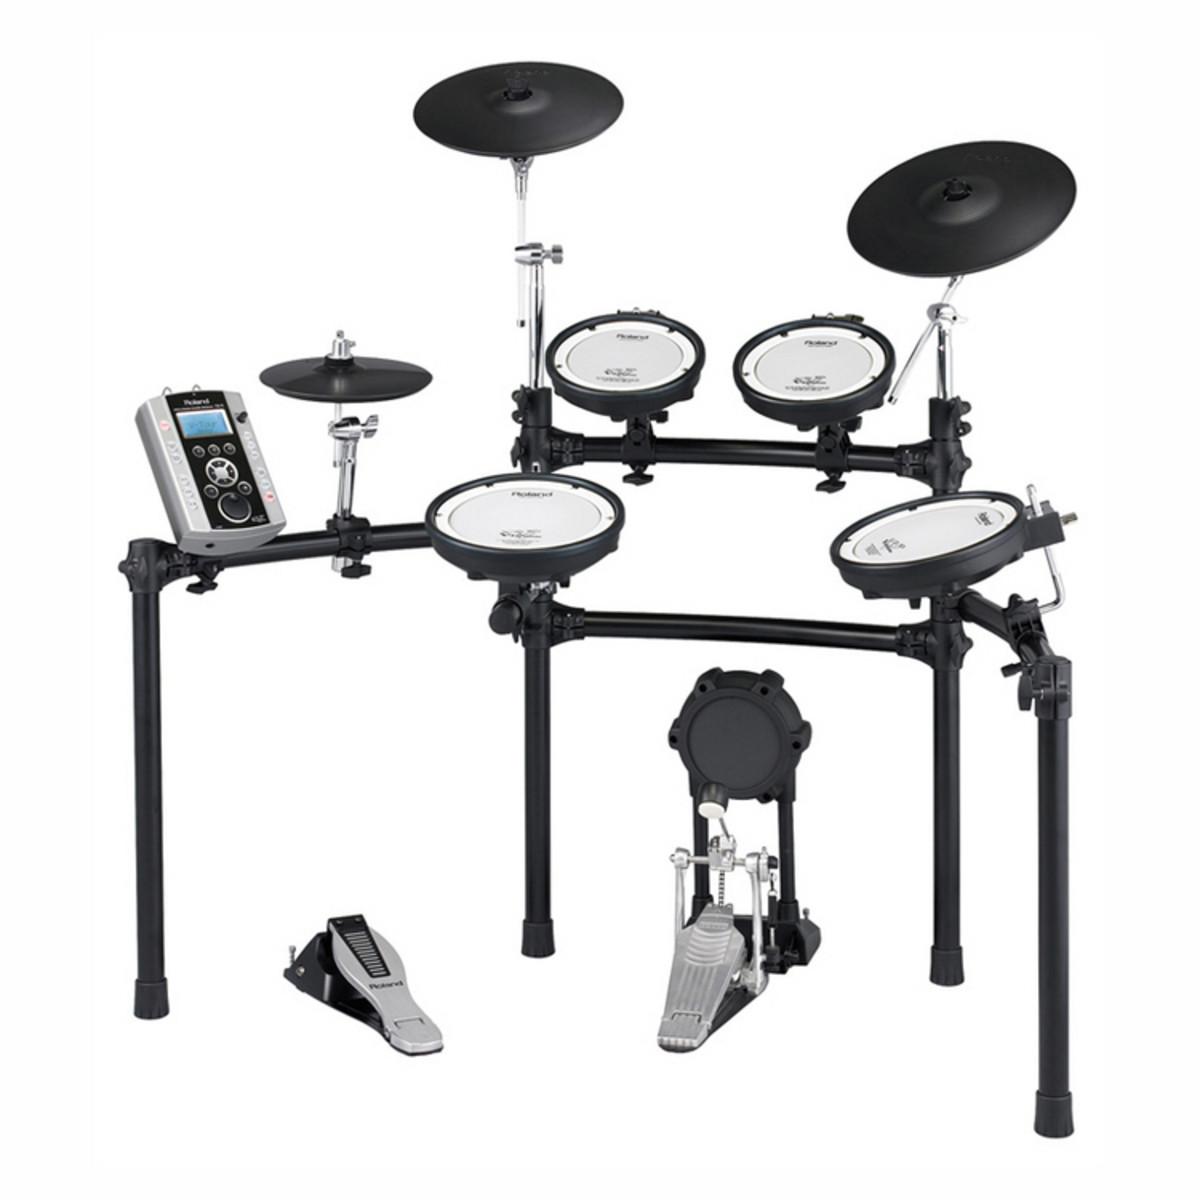 9fd94b2089db Discontinued Roland TD-9K2 V-Drum V-Tour Series Digital Drum Kit at  Gear4music